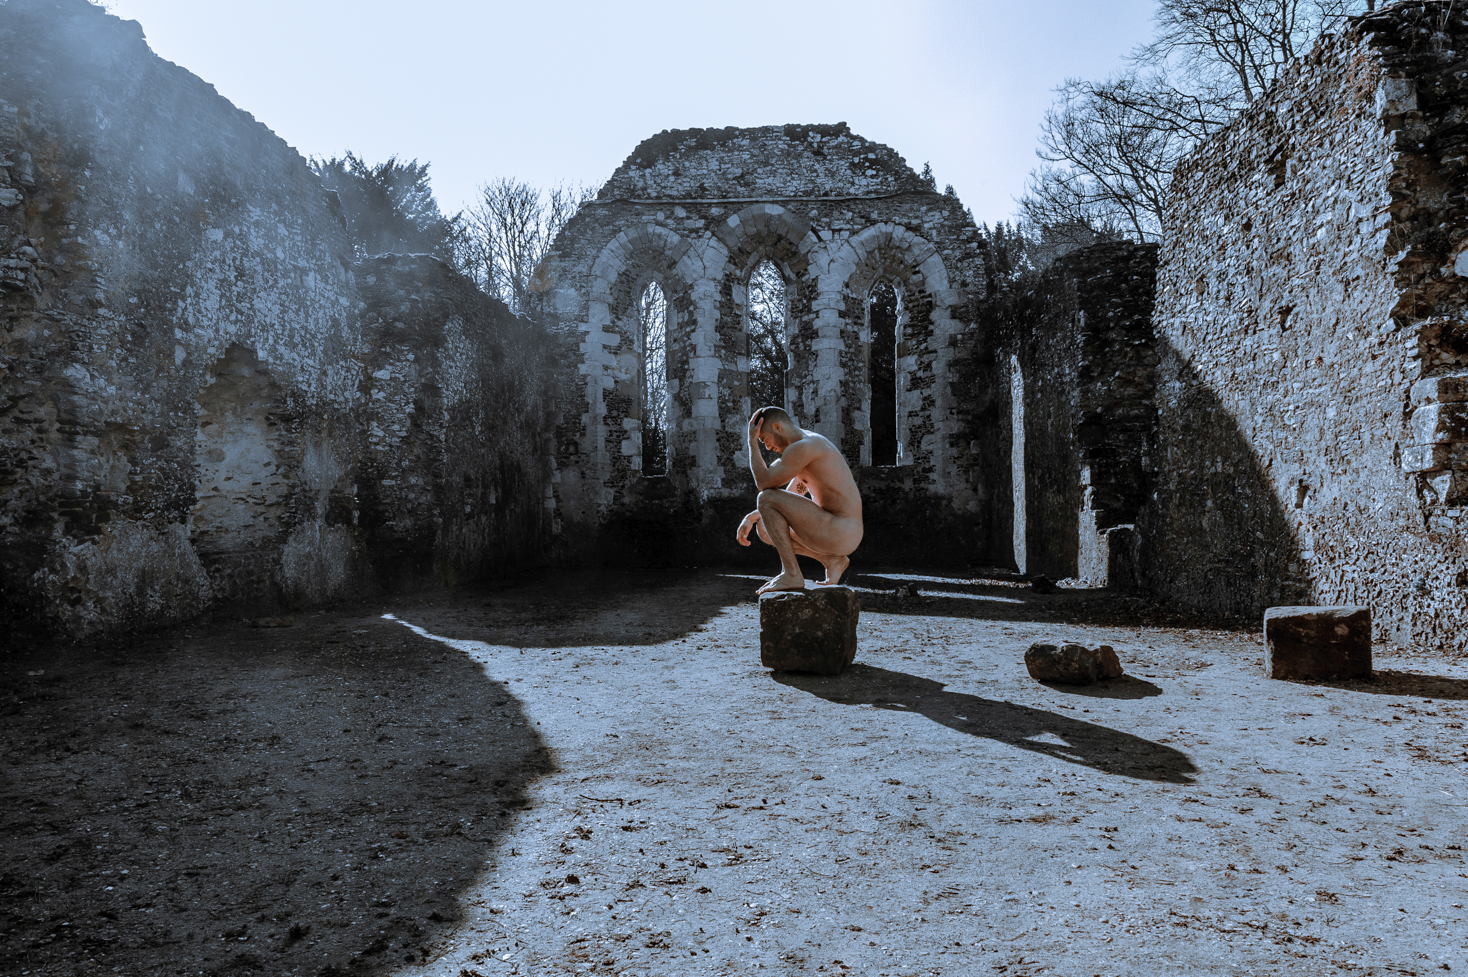 Fine art nude by Farnham, Surrey based portrait photographer James Muller